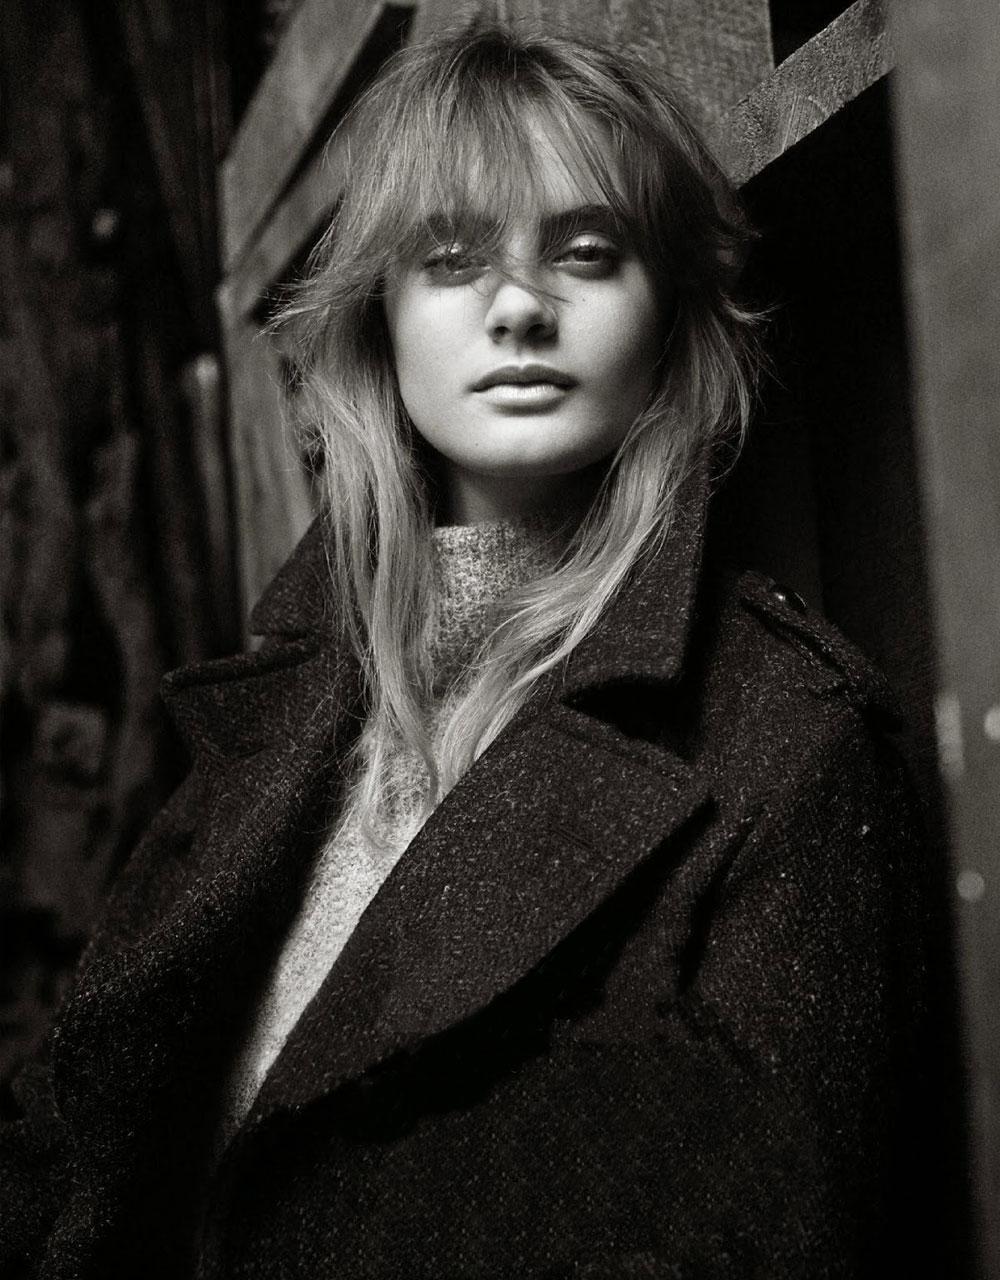 Oracle, Fox, Violoette, D-Urso, Scott, Trindle, Miss, Vogue, Paris, Industrial, Androgynous, Fashion, Editorial,